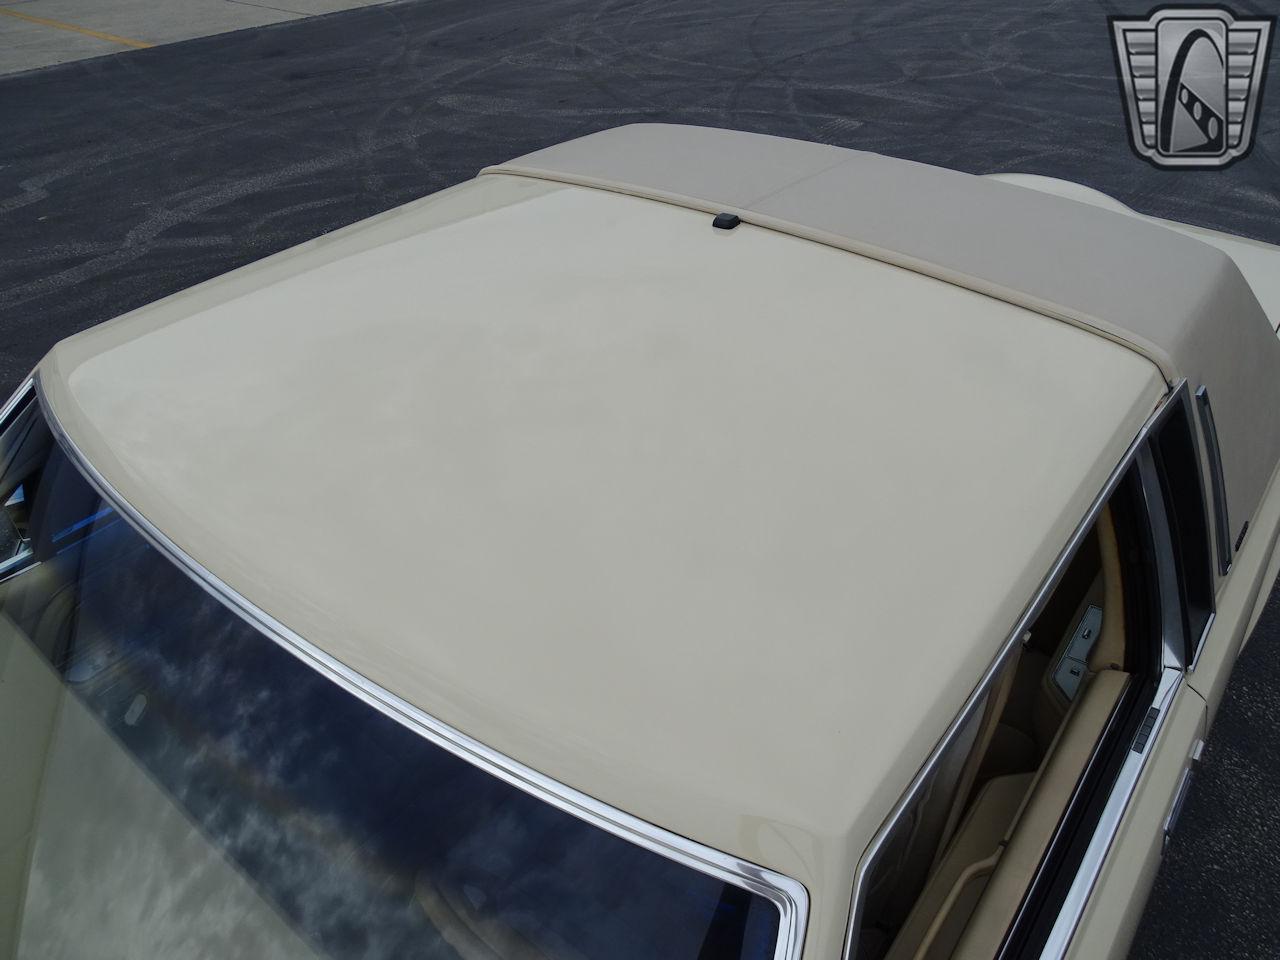 1983 Lincoln Continental 97